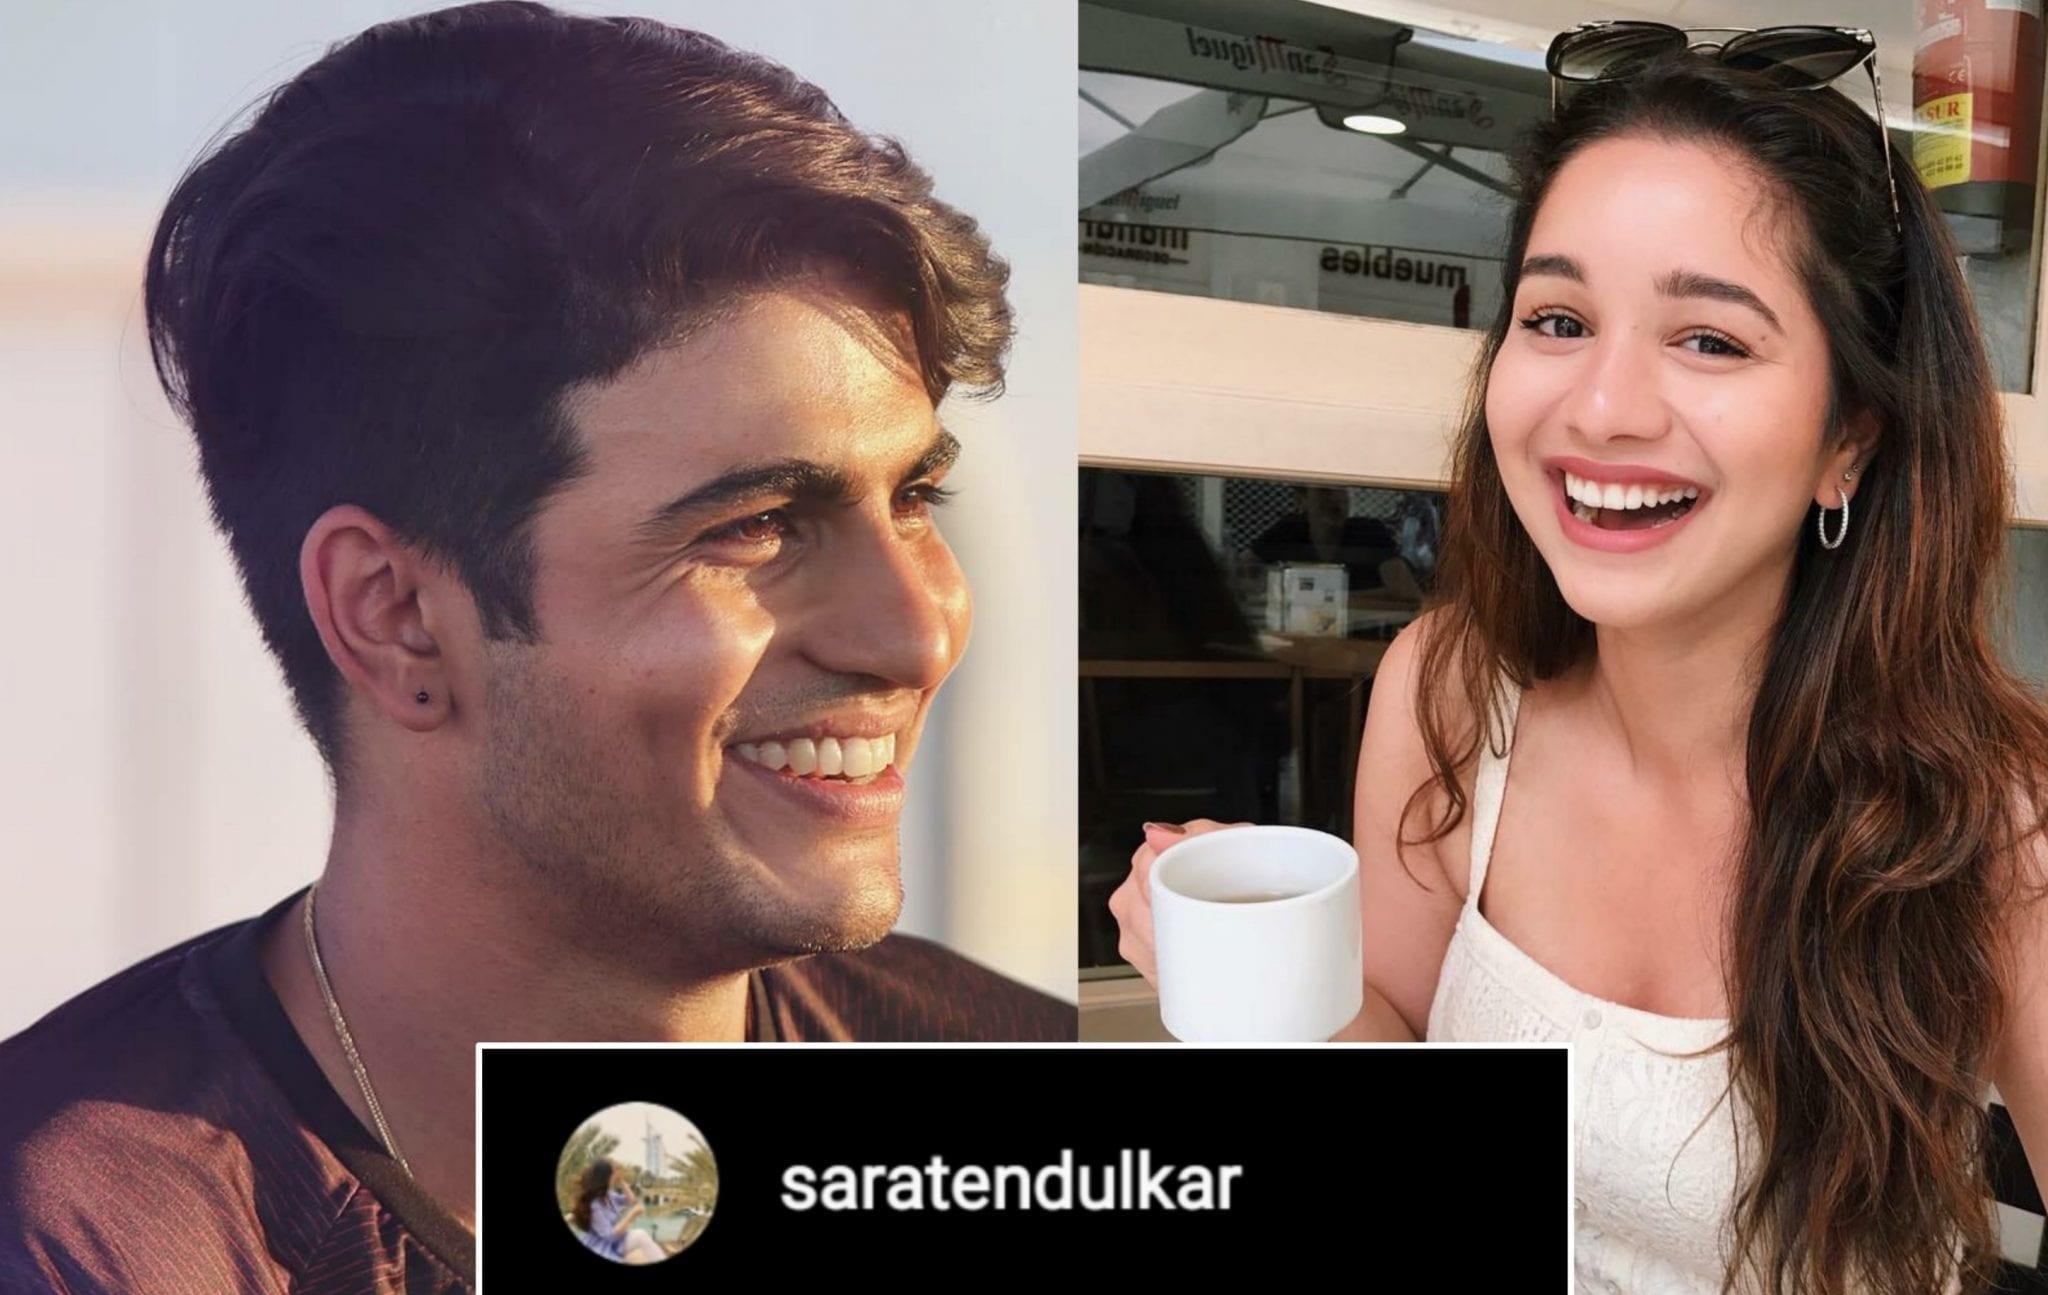 Is Sara Tendulkar dating Shubman Gill?